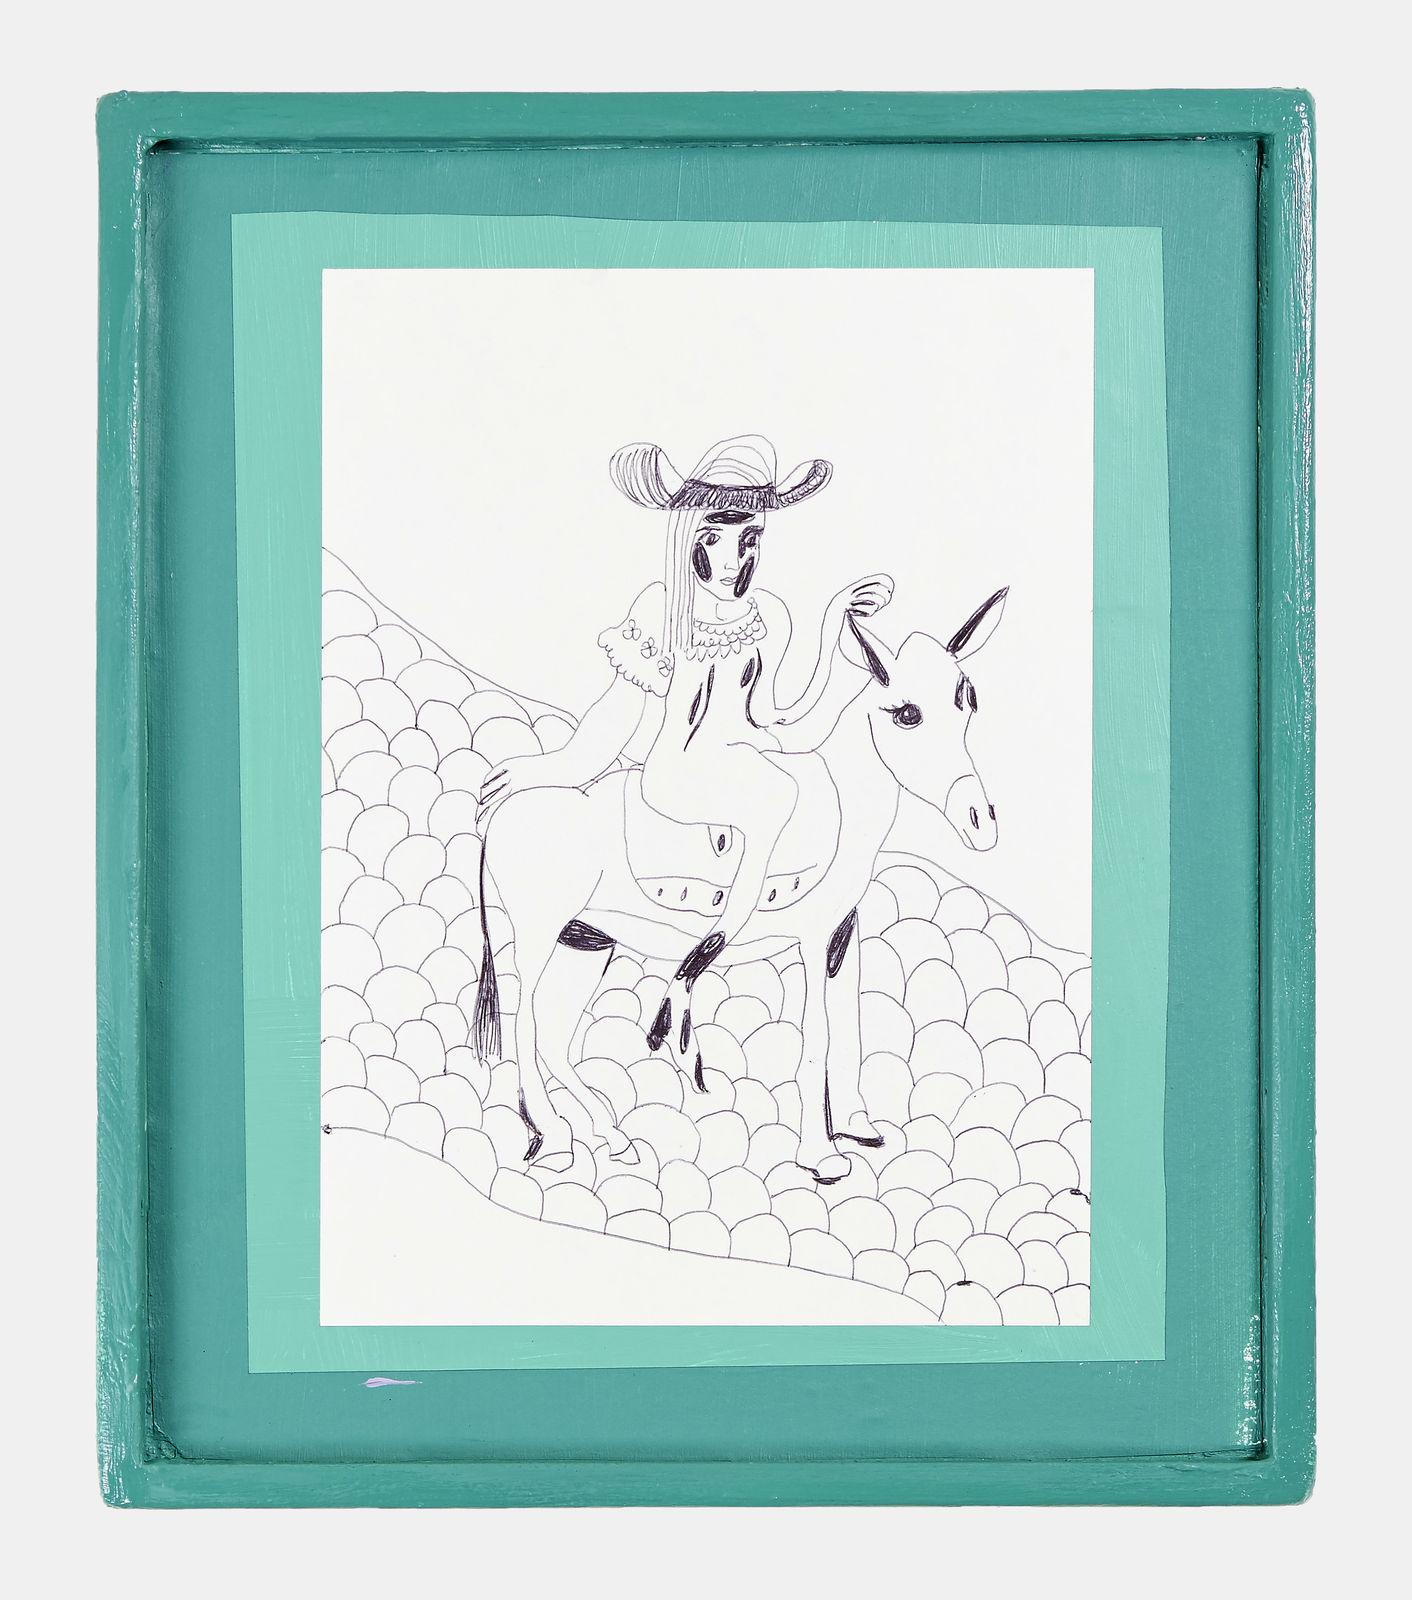 20161006 - HORIZONT GALÉRIA (60D)1517